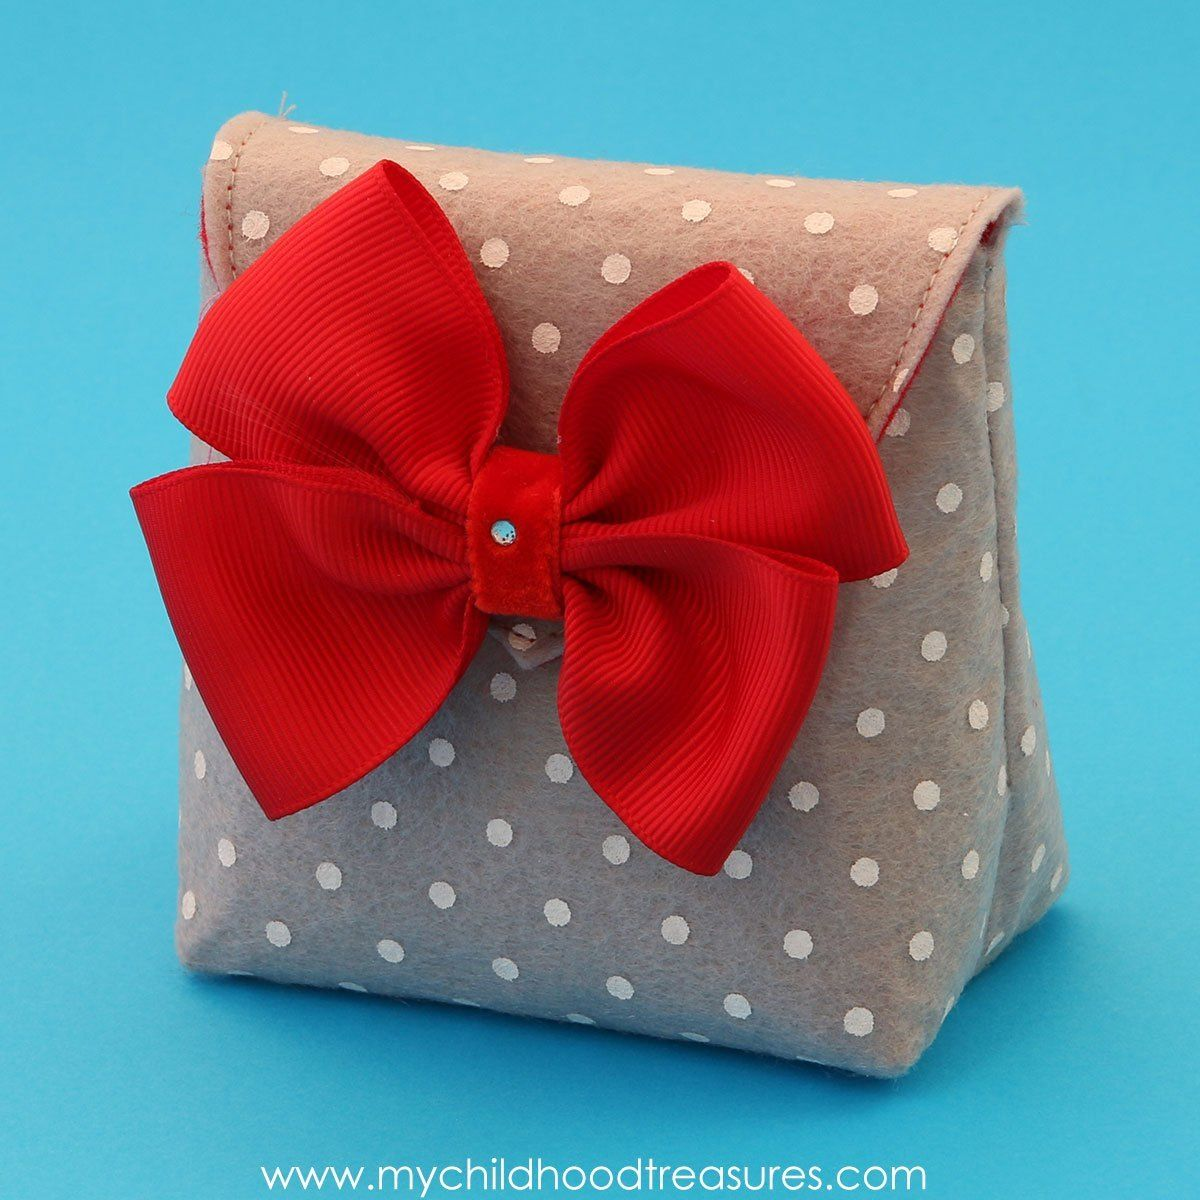 How to Make a Gift Bag - DIY Felt Gift Bag (With images ...